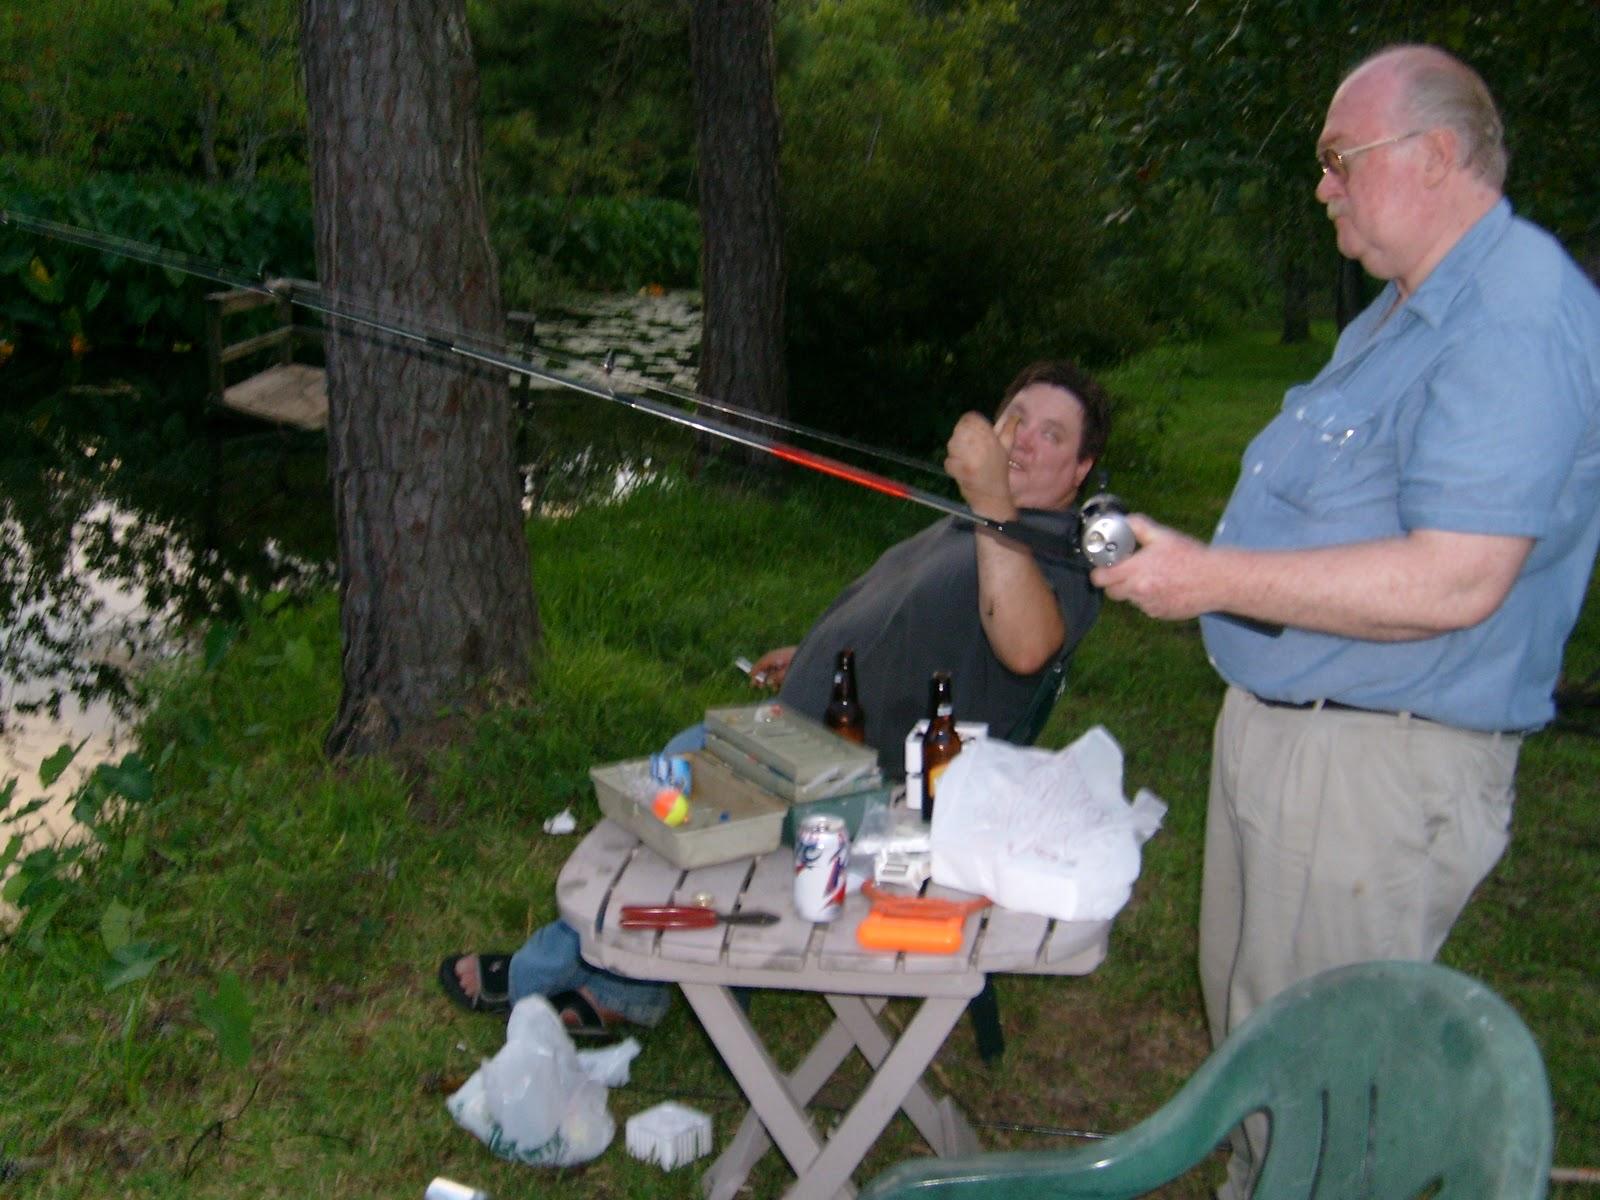 Dads Birthday Party - S7300229.JPG